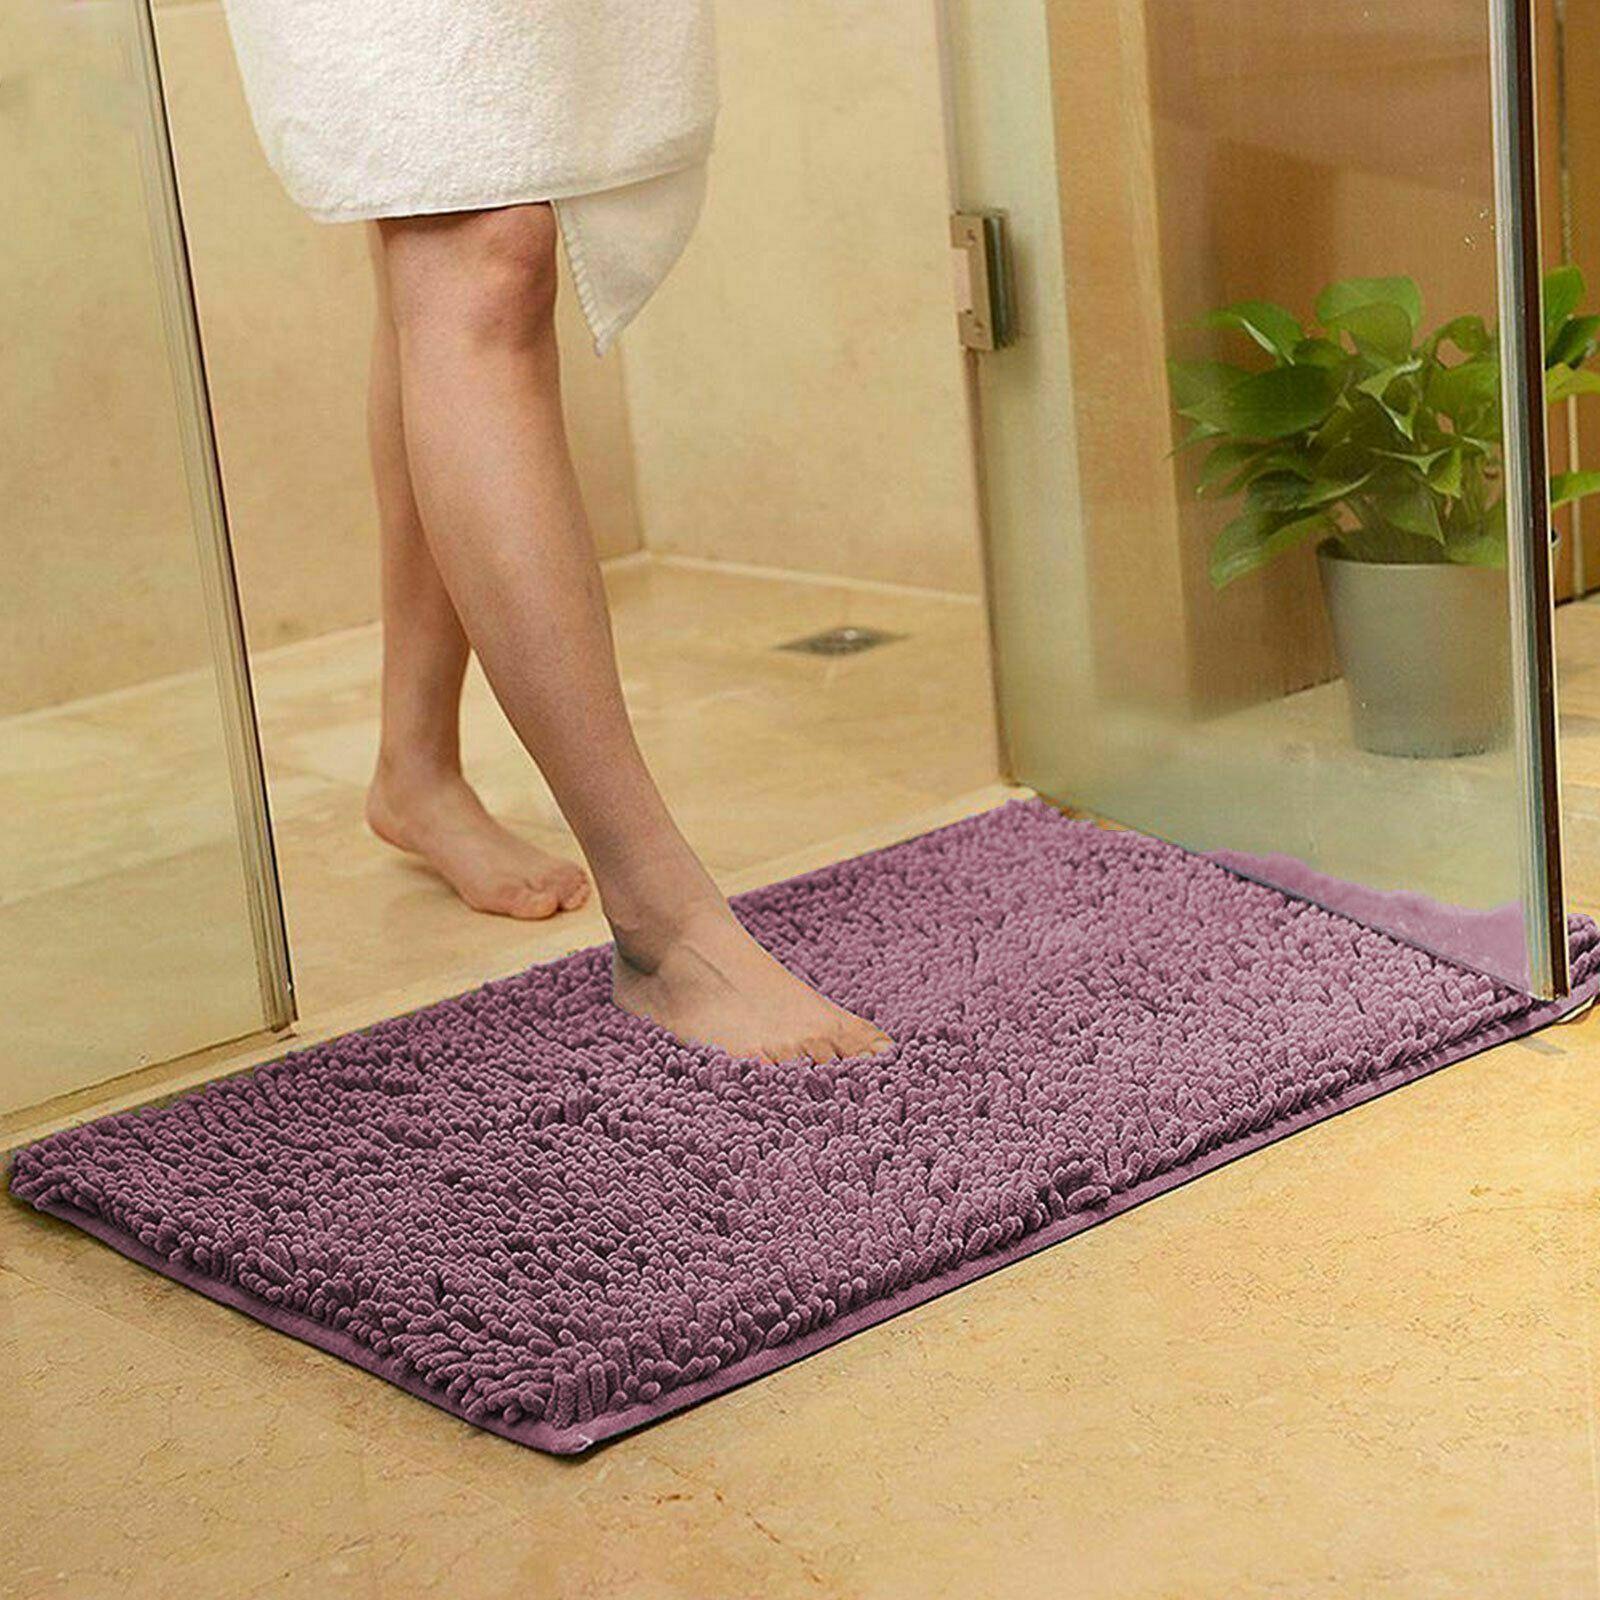 Https Ift Tt 2pwtt9f Bath Mats Ideas Of Bath Mats Bathmats Memory Non Slip Absorbent Soft Bathroom Be In 2020 Floor Rugs Bedroom Bath Mat Rug Rugs On Carpet [ 1600 x 1600 Pixel ]